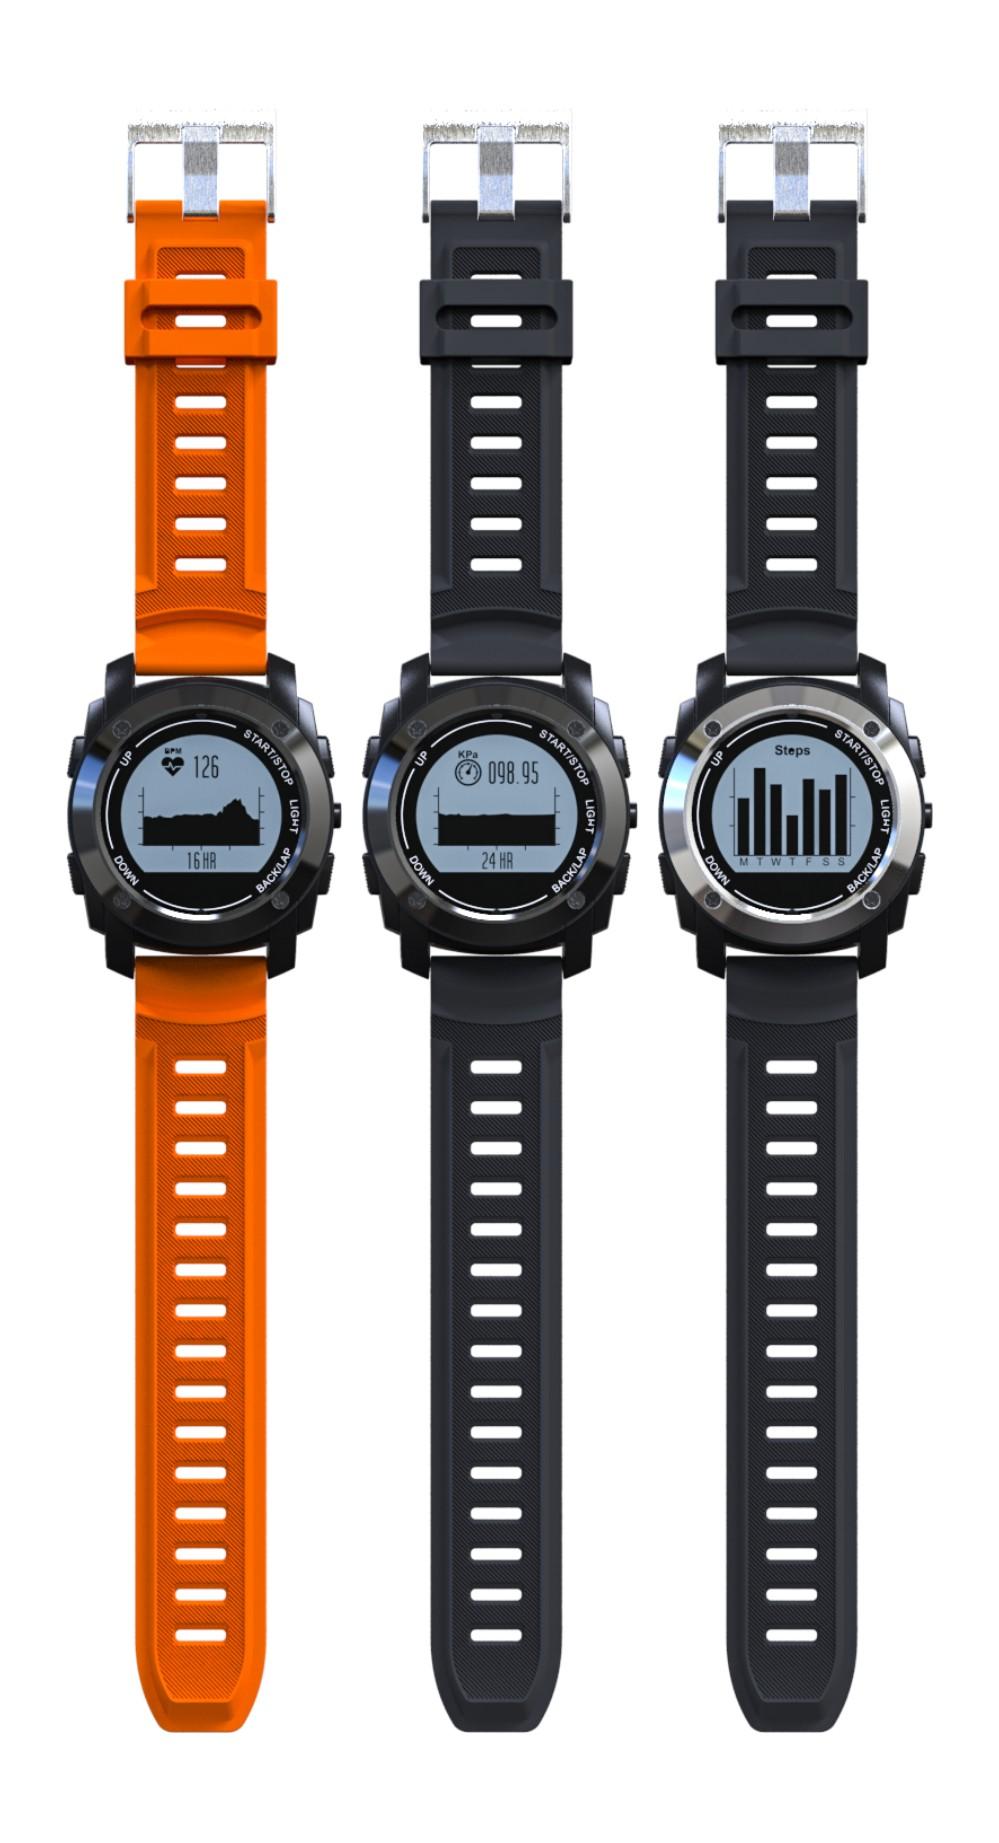 Smartch Sports Smart Watch S928 Support G-sensor GPS Smart ...